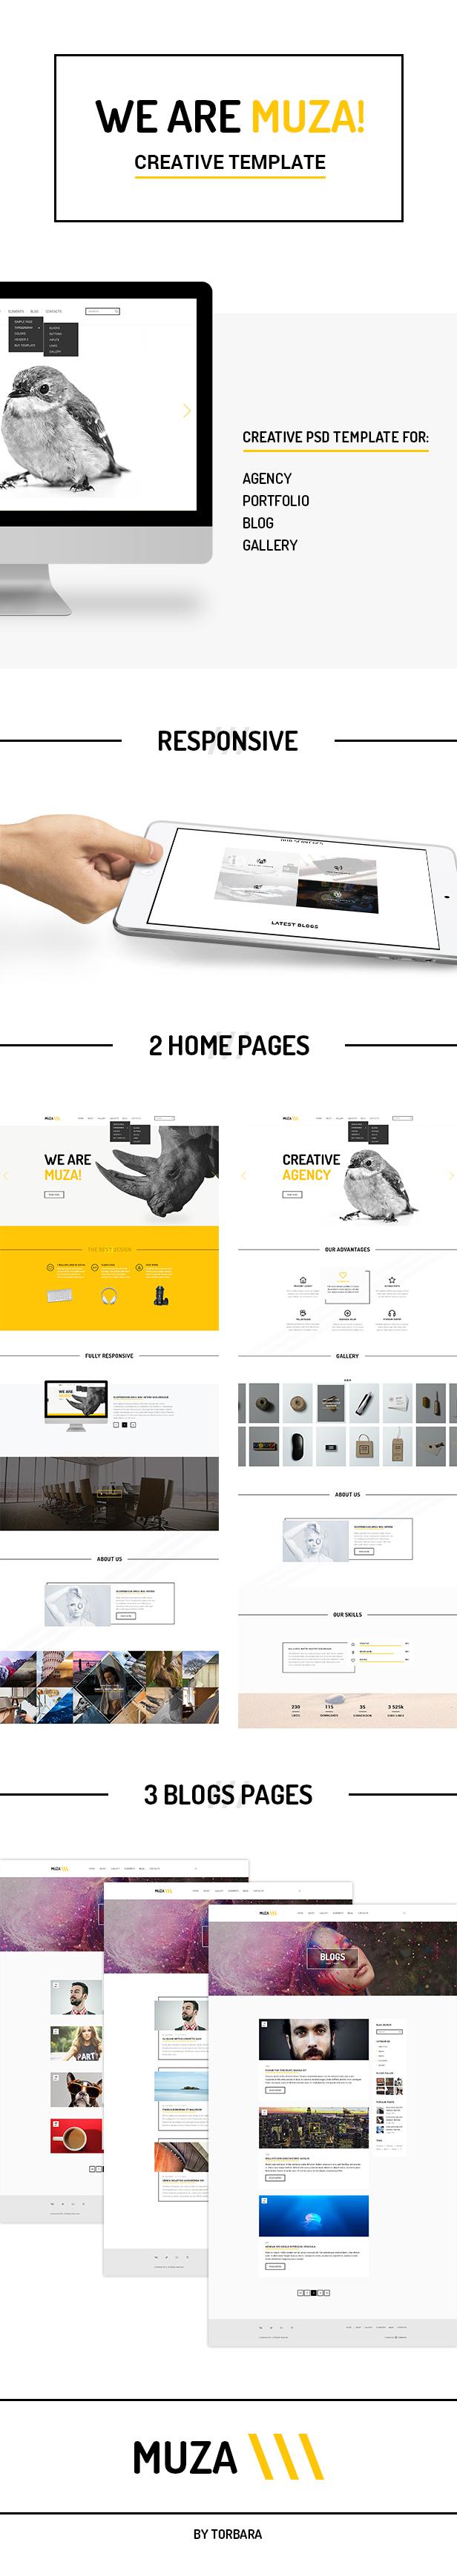 Muza — Creative Portfolio or Agency PSD Template - 2